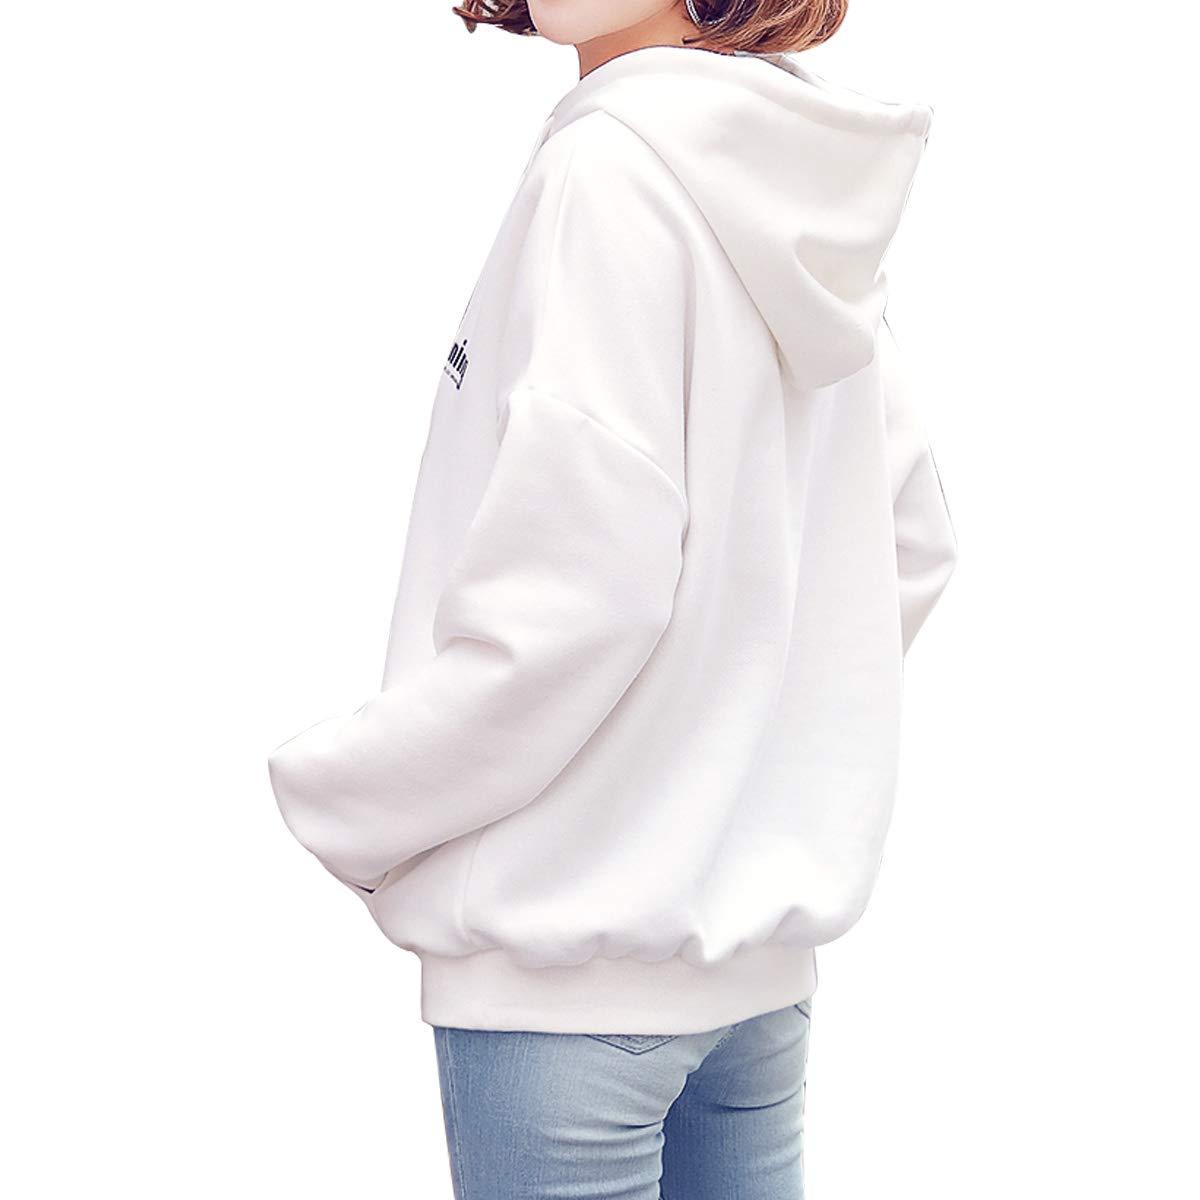 Fashion Sweatshirts (White, Small)